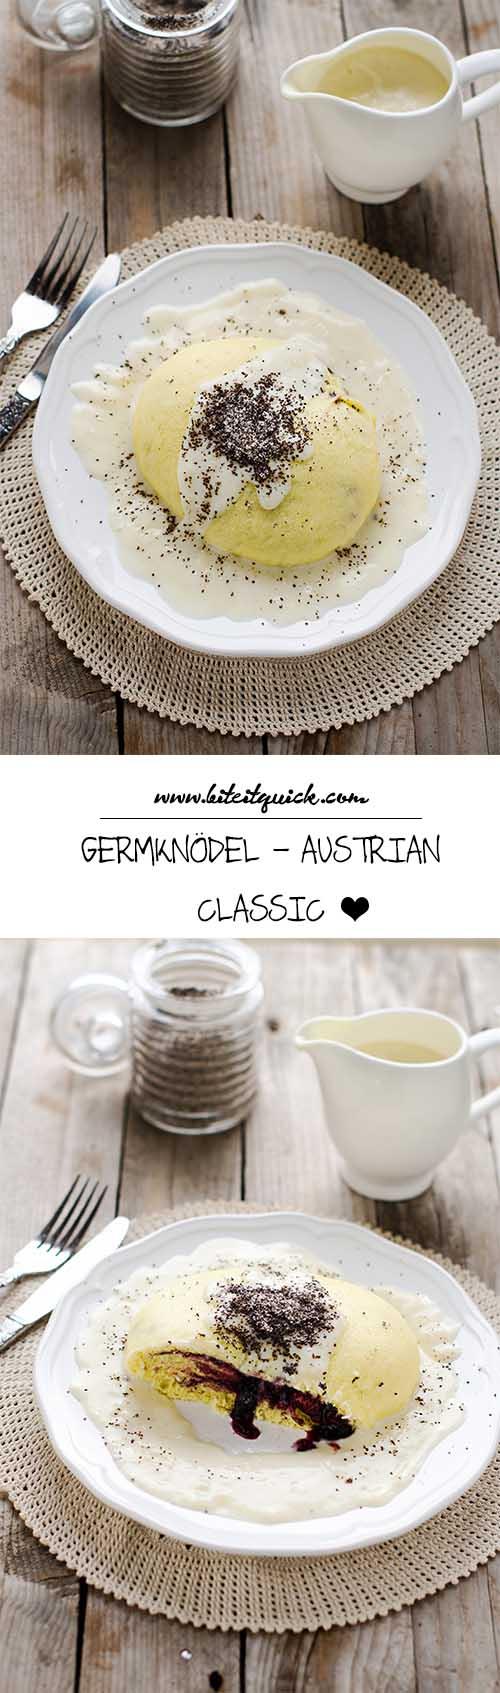 Germknödel- Austrian Classic ♥